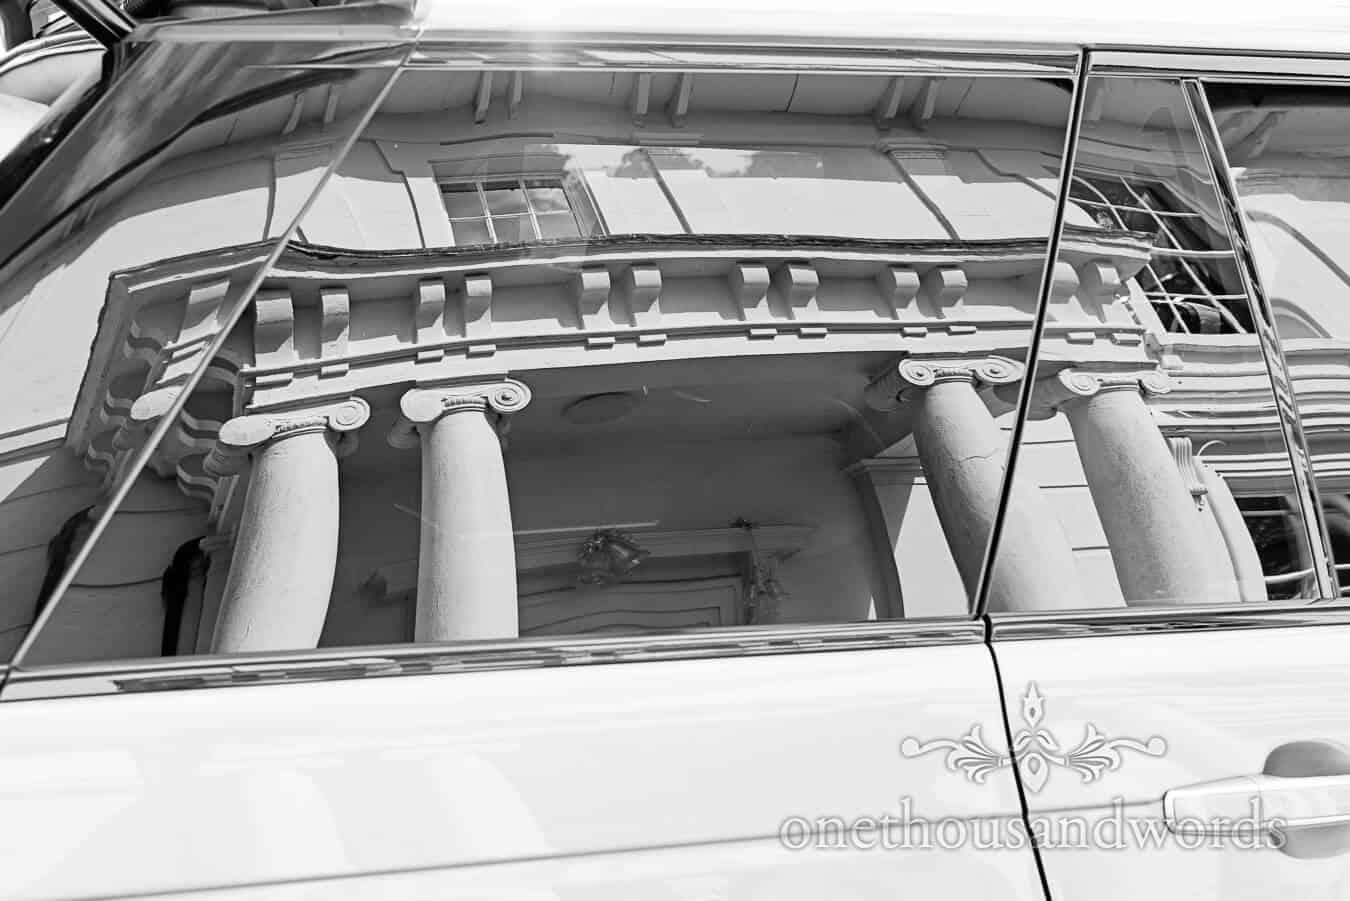 Reflection of Countryside house Wedding venue in wedding car window